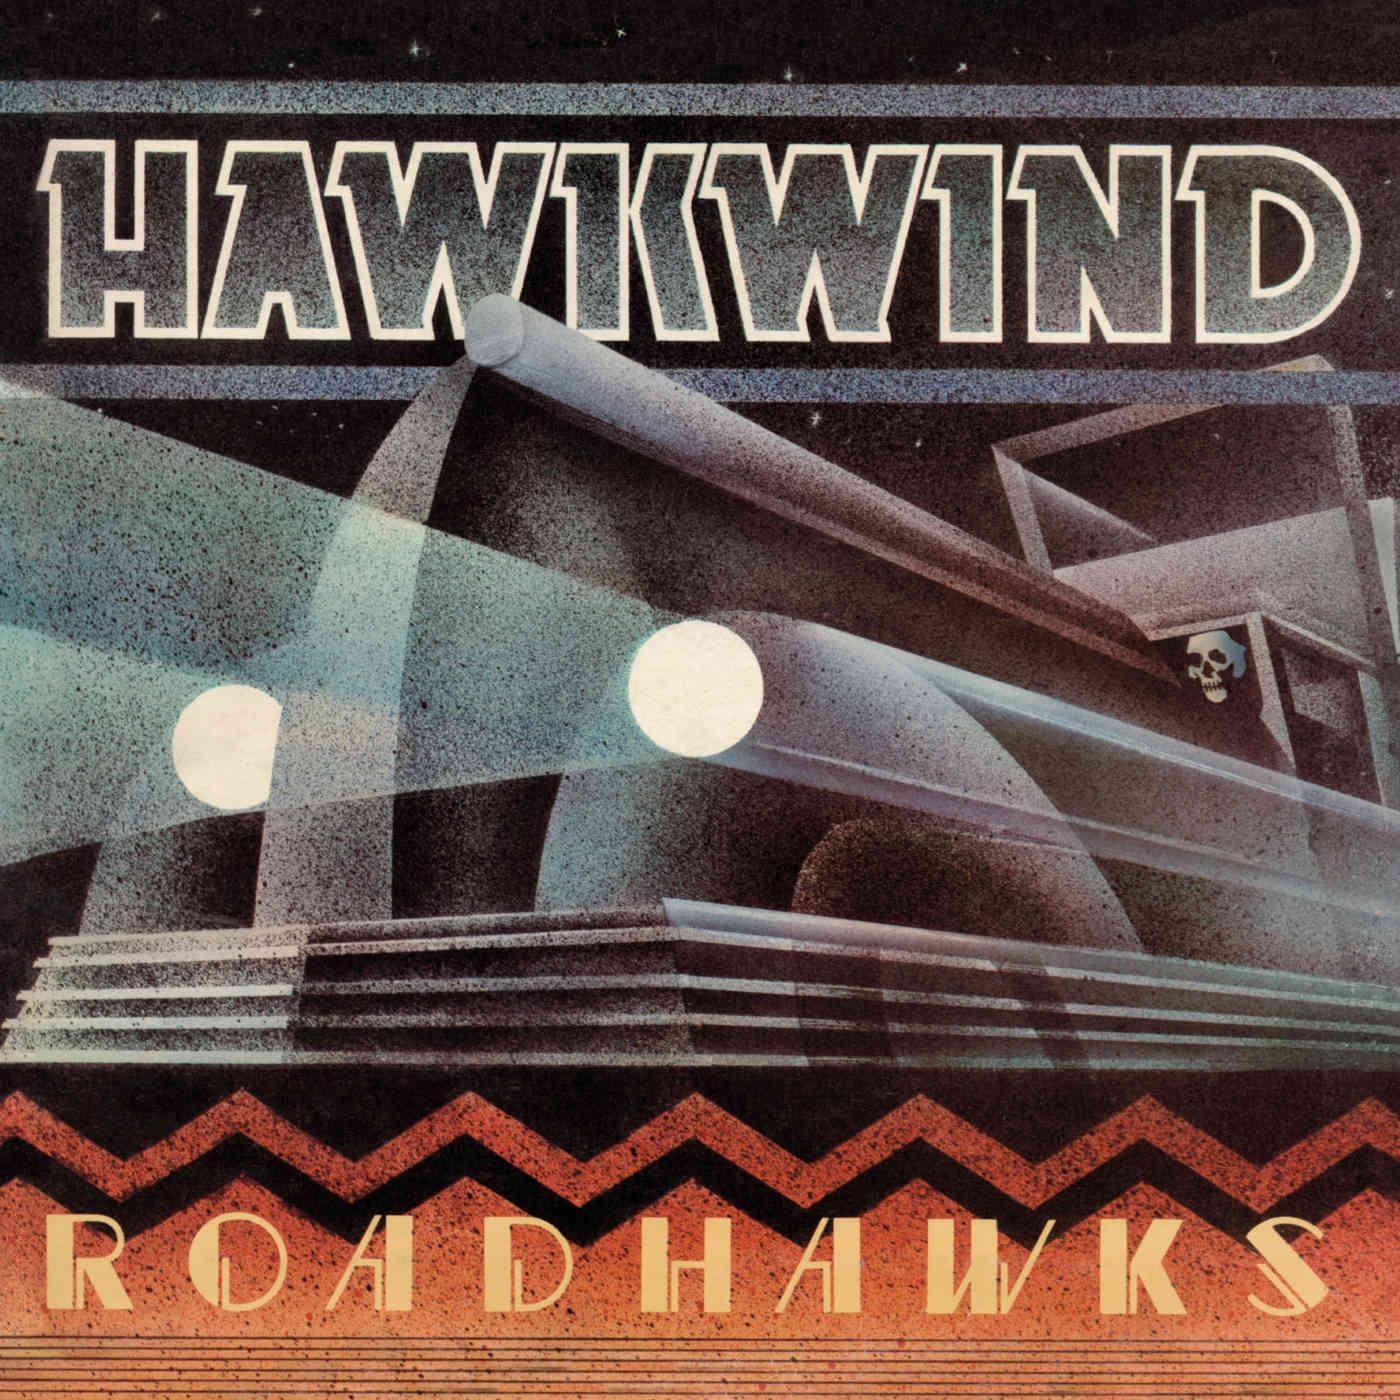 Hawkwind Roadhawks 180 Gram Remastered Vinyl Edition